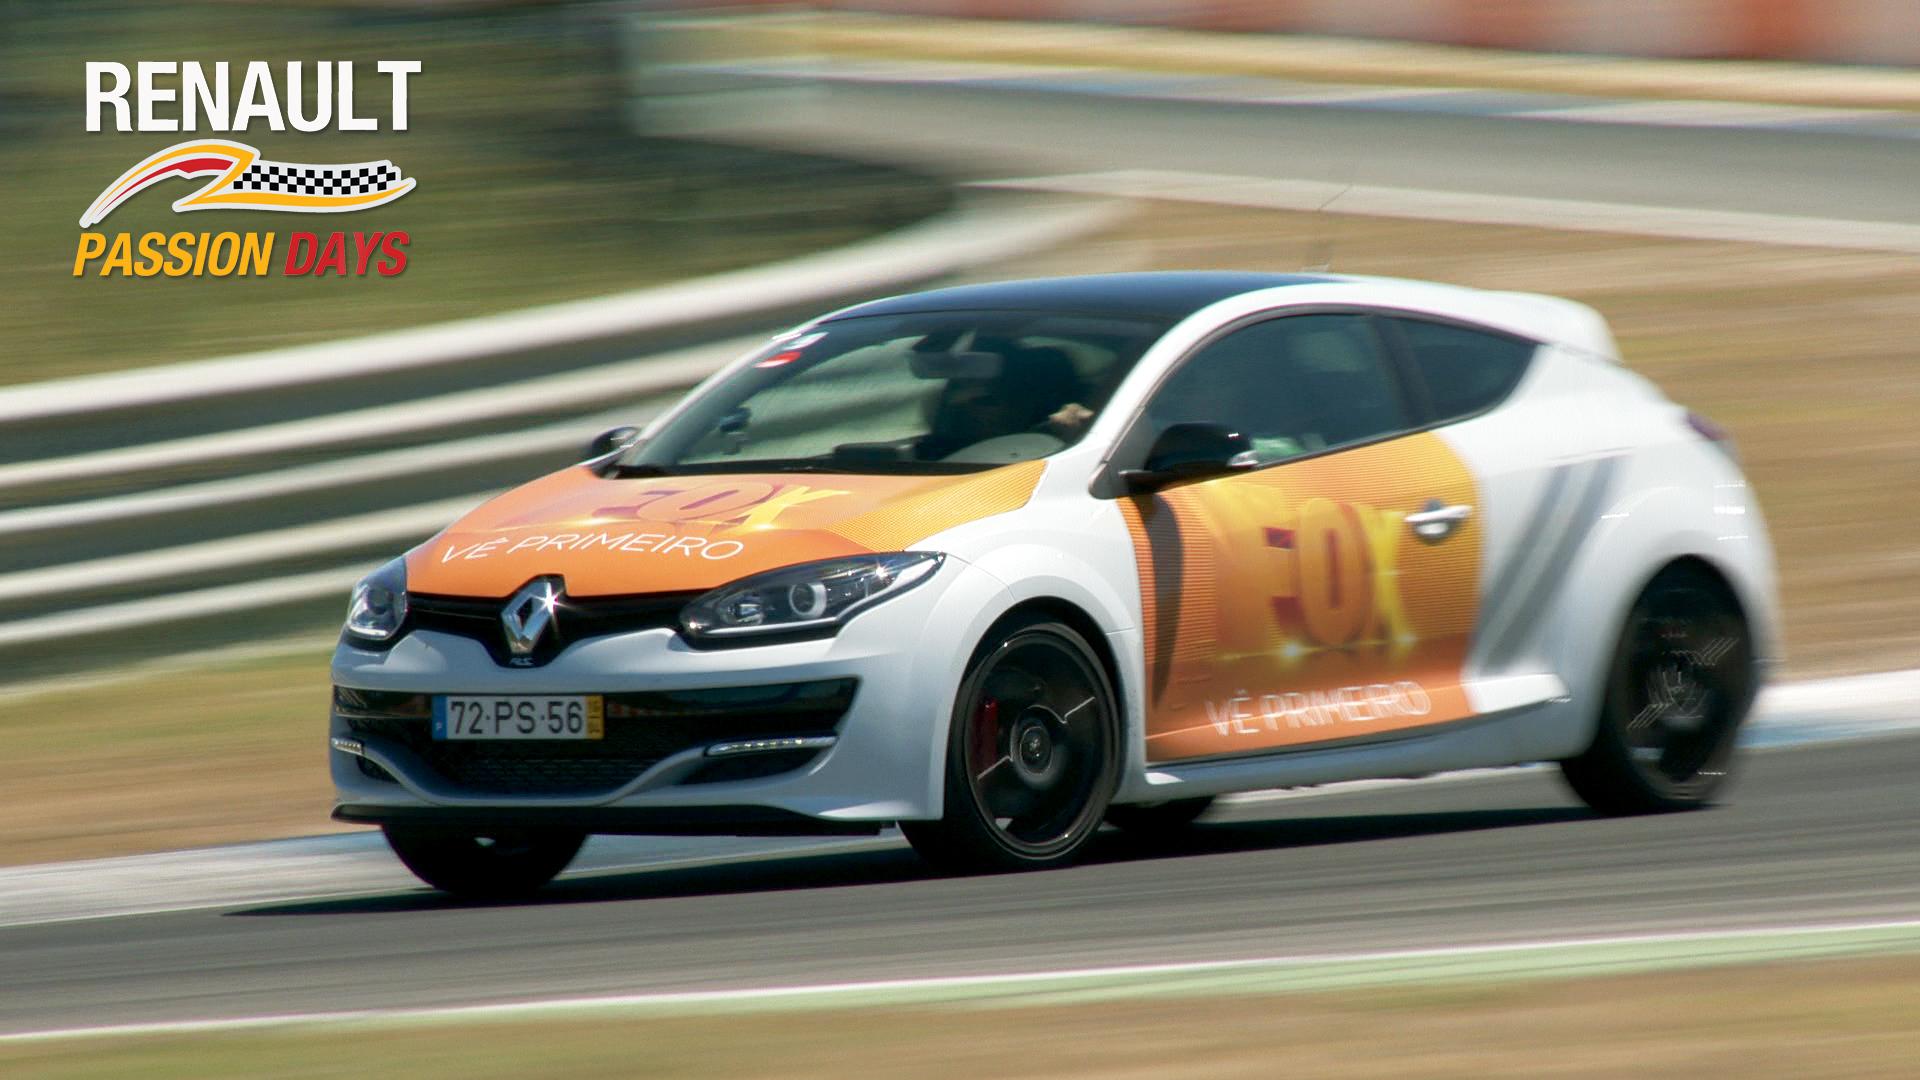 Renault Megane no Circuito do Estoril